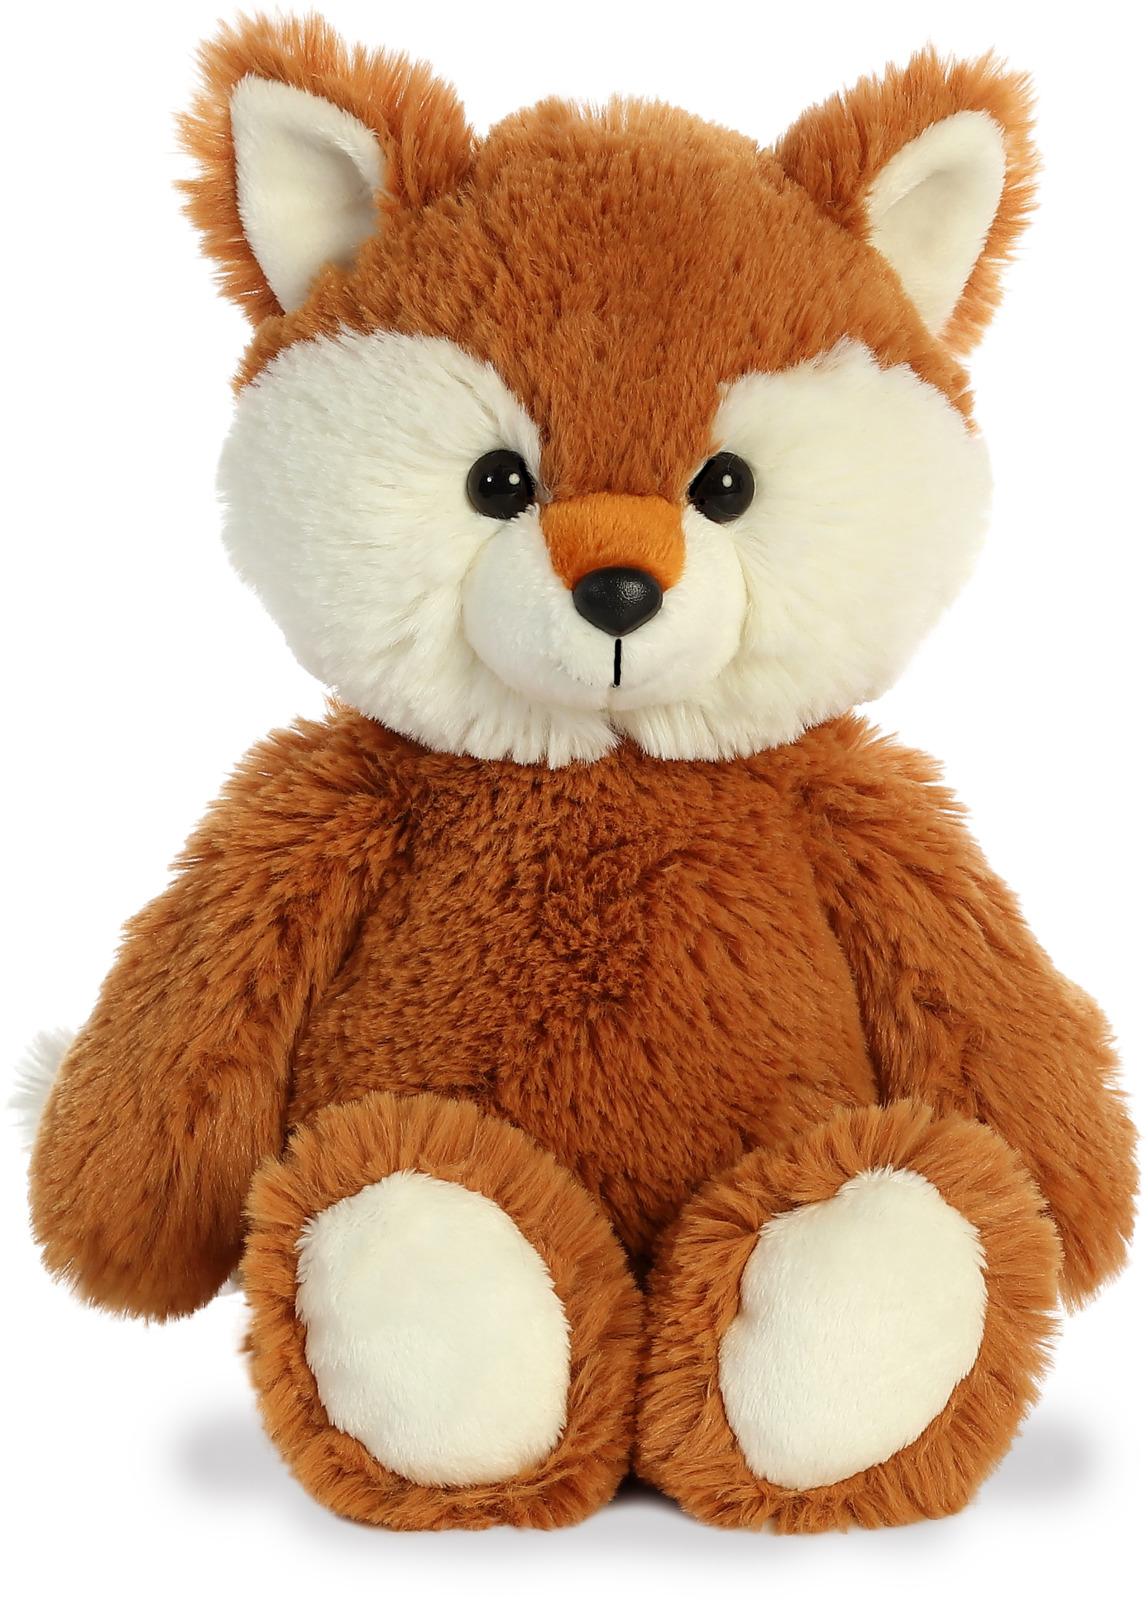 картинка мягкой игрушки зверей валенка